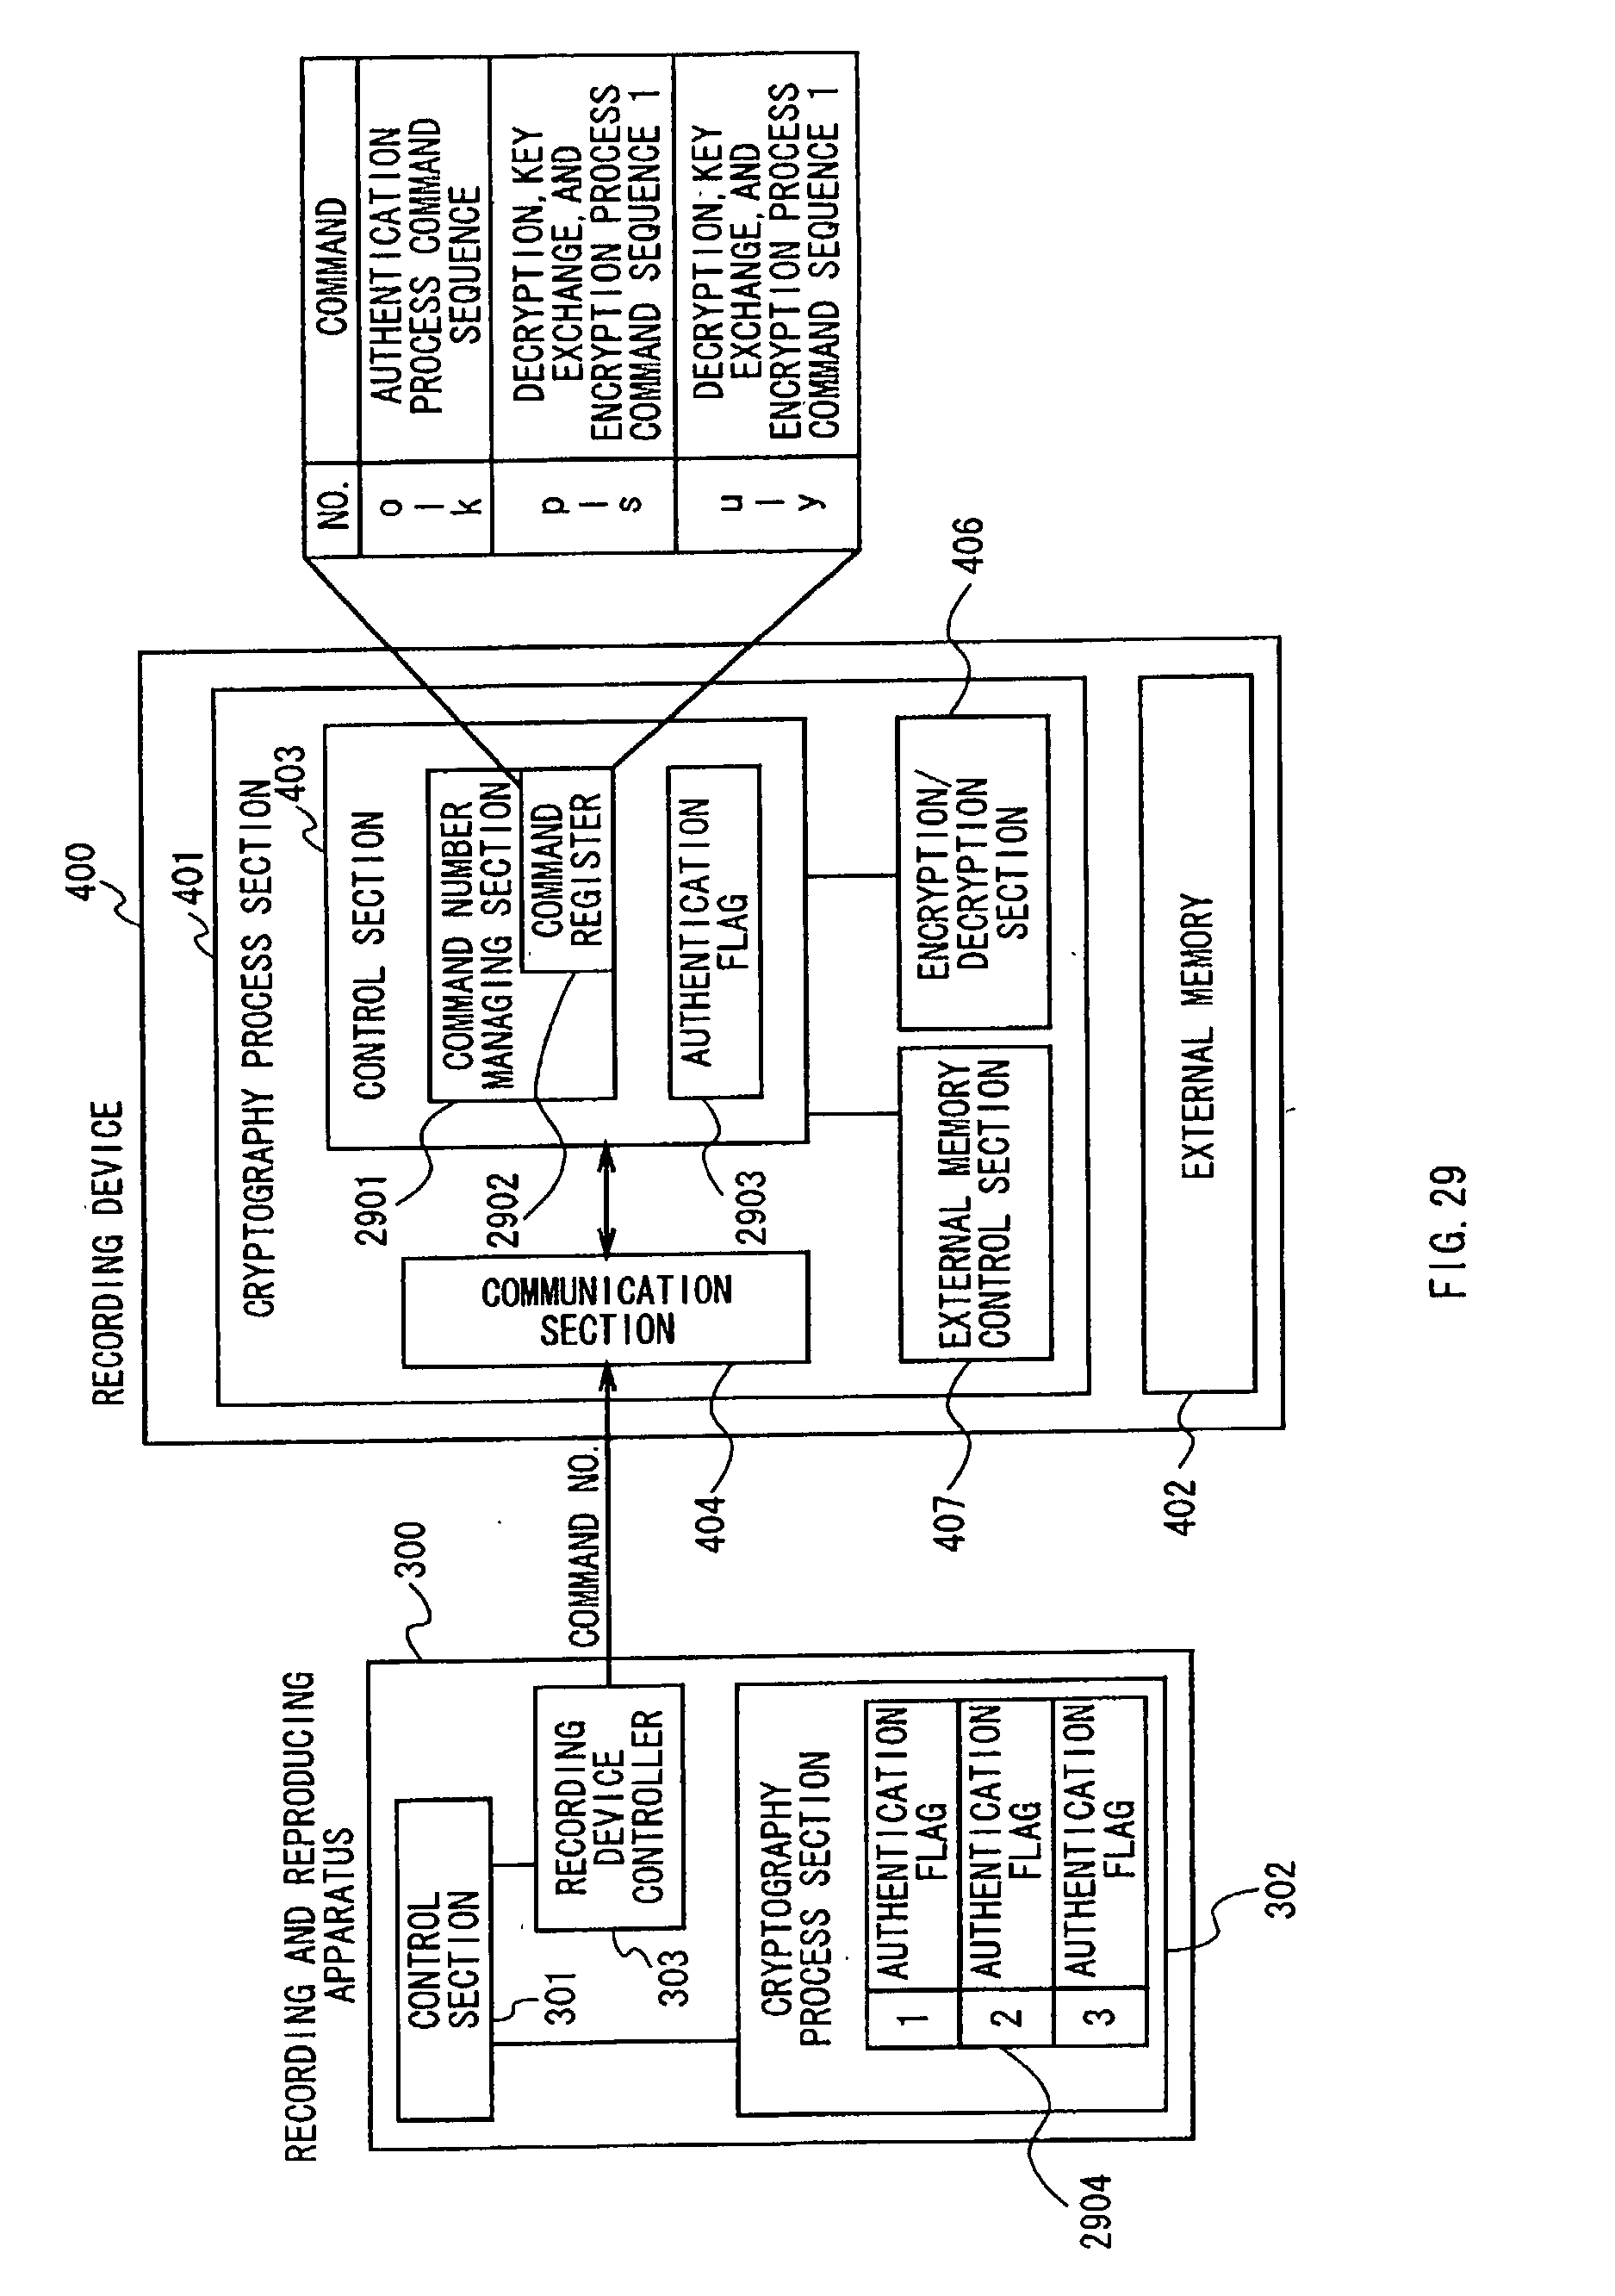 Ecc S14 Wiring Diagram L3 2000 Bluebird Bus M11 T1 Patent Us 20020169971a1 On